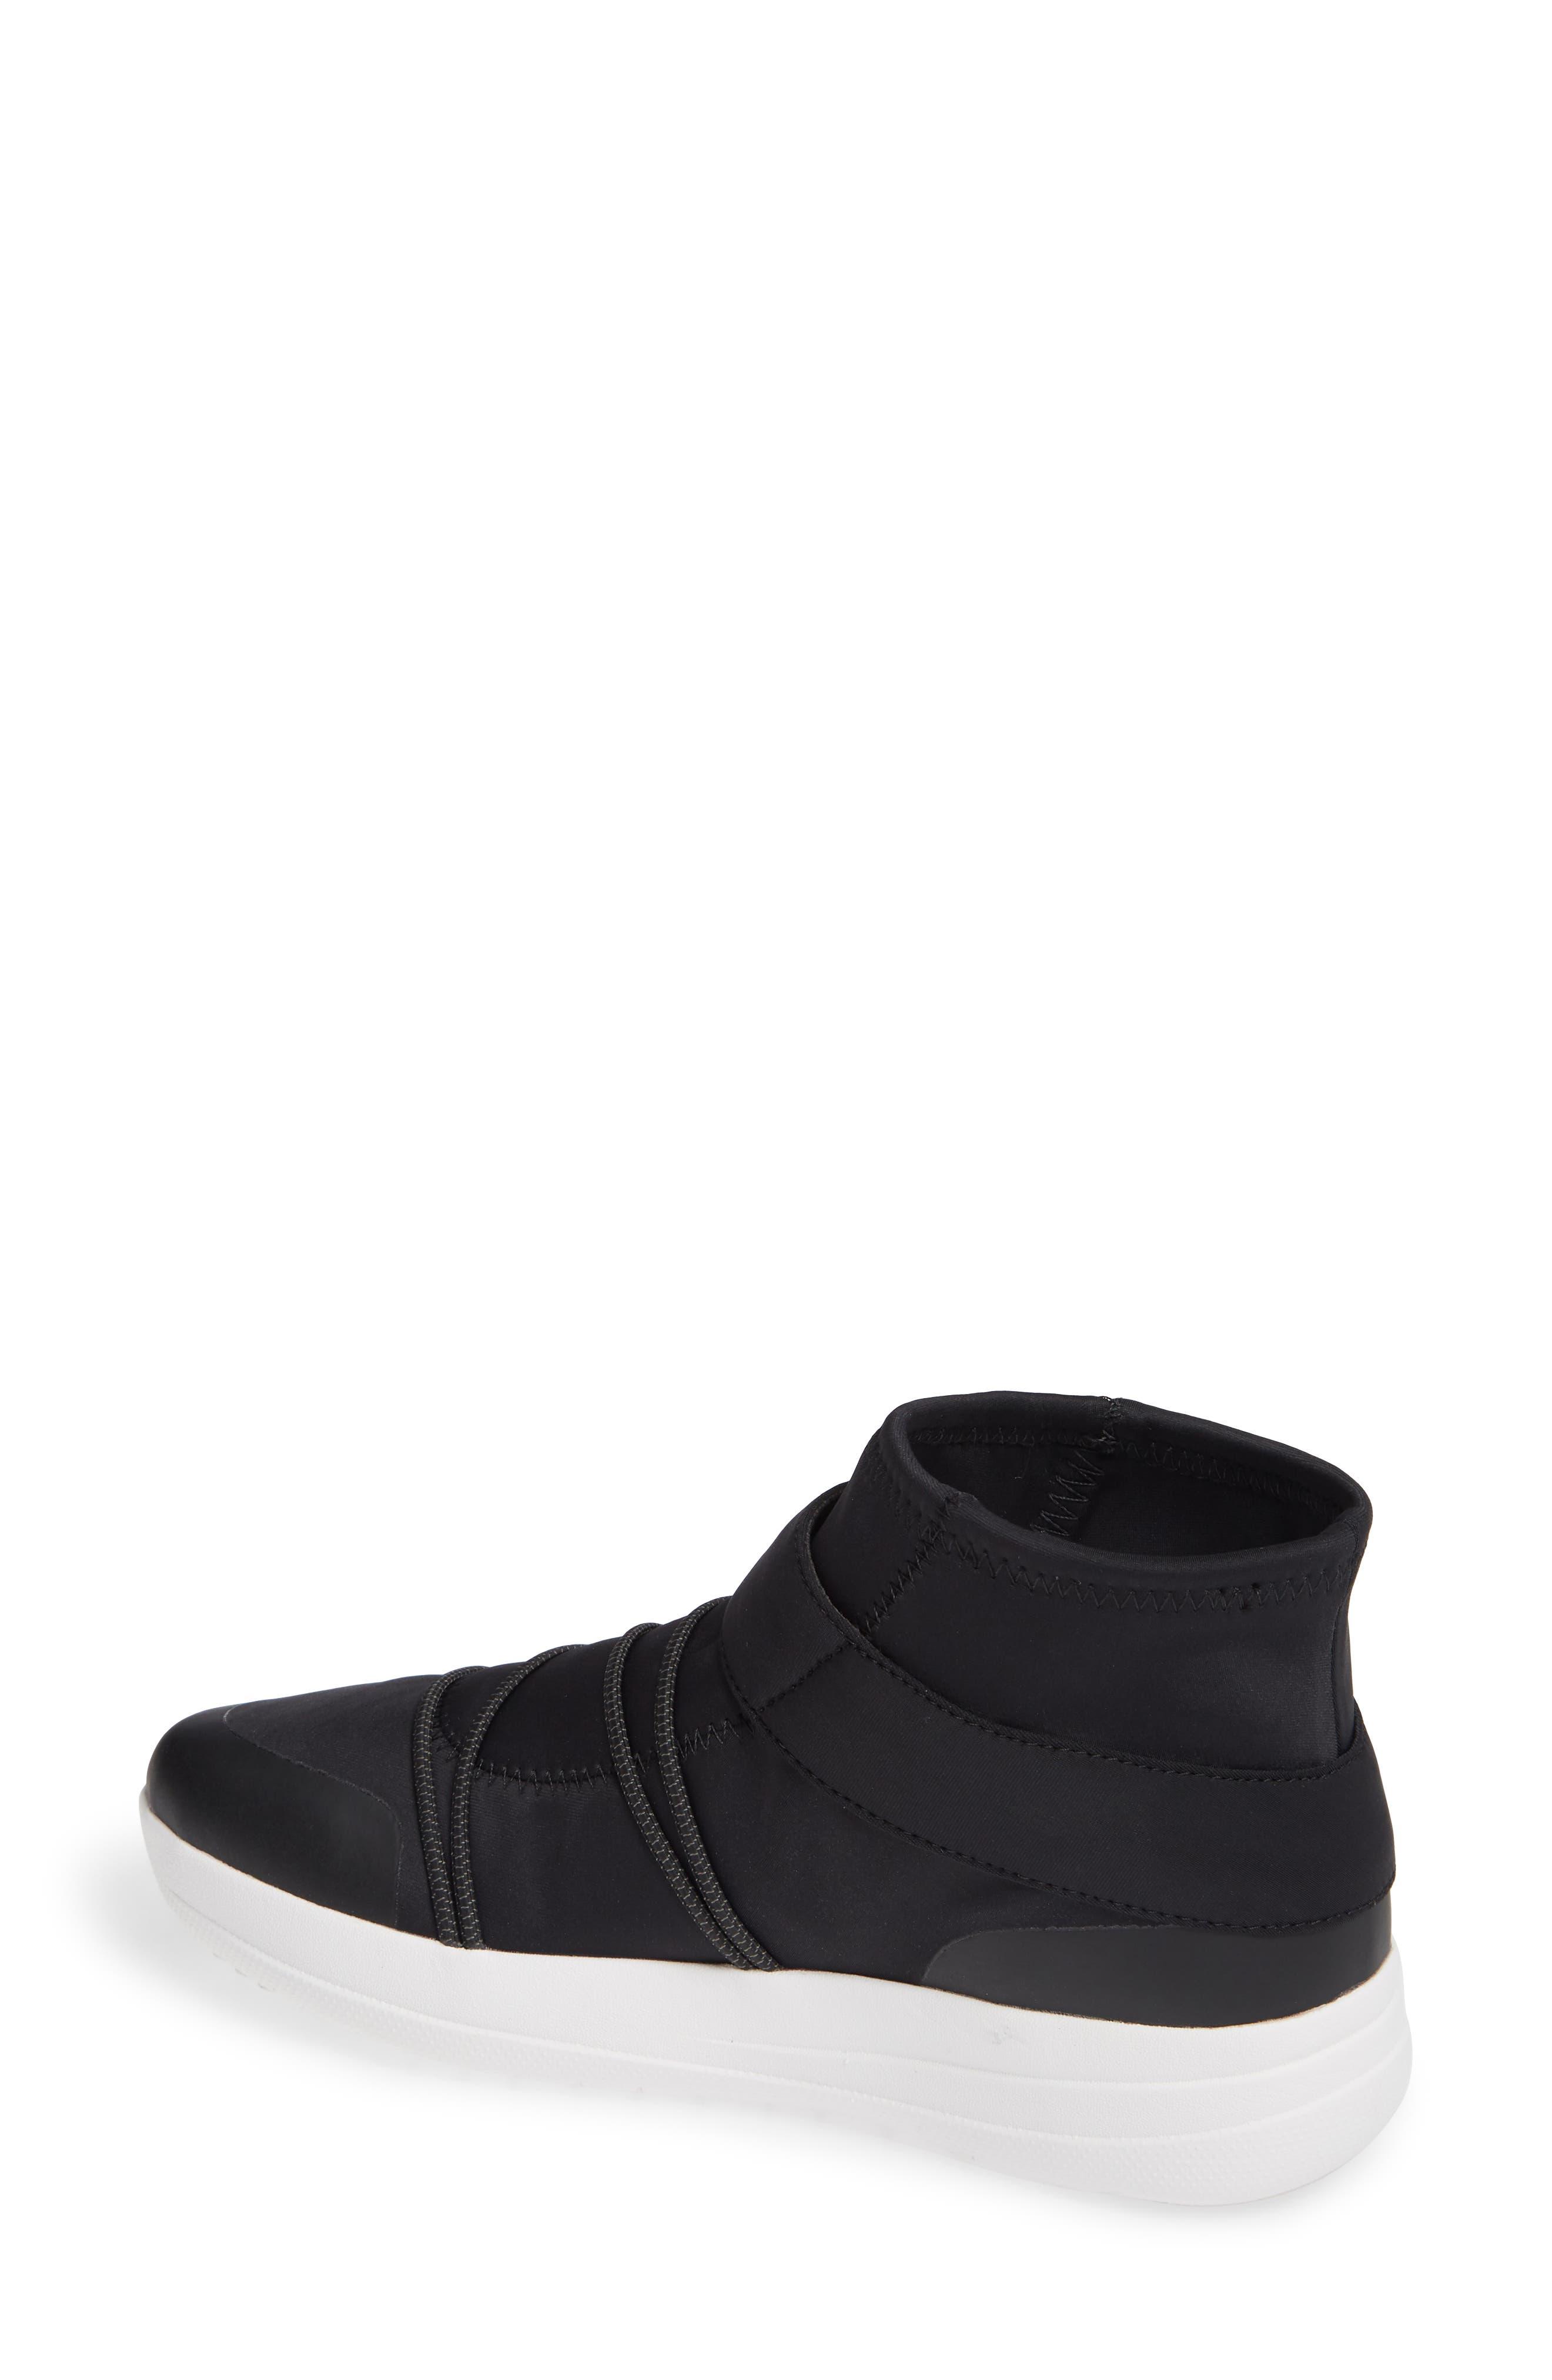 Neoflex High Top Sneaker,                             Alternate thumbnail 2, color,                             BLACK FABRIC